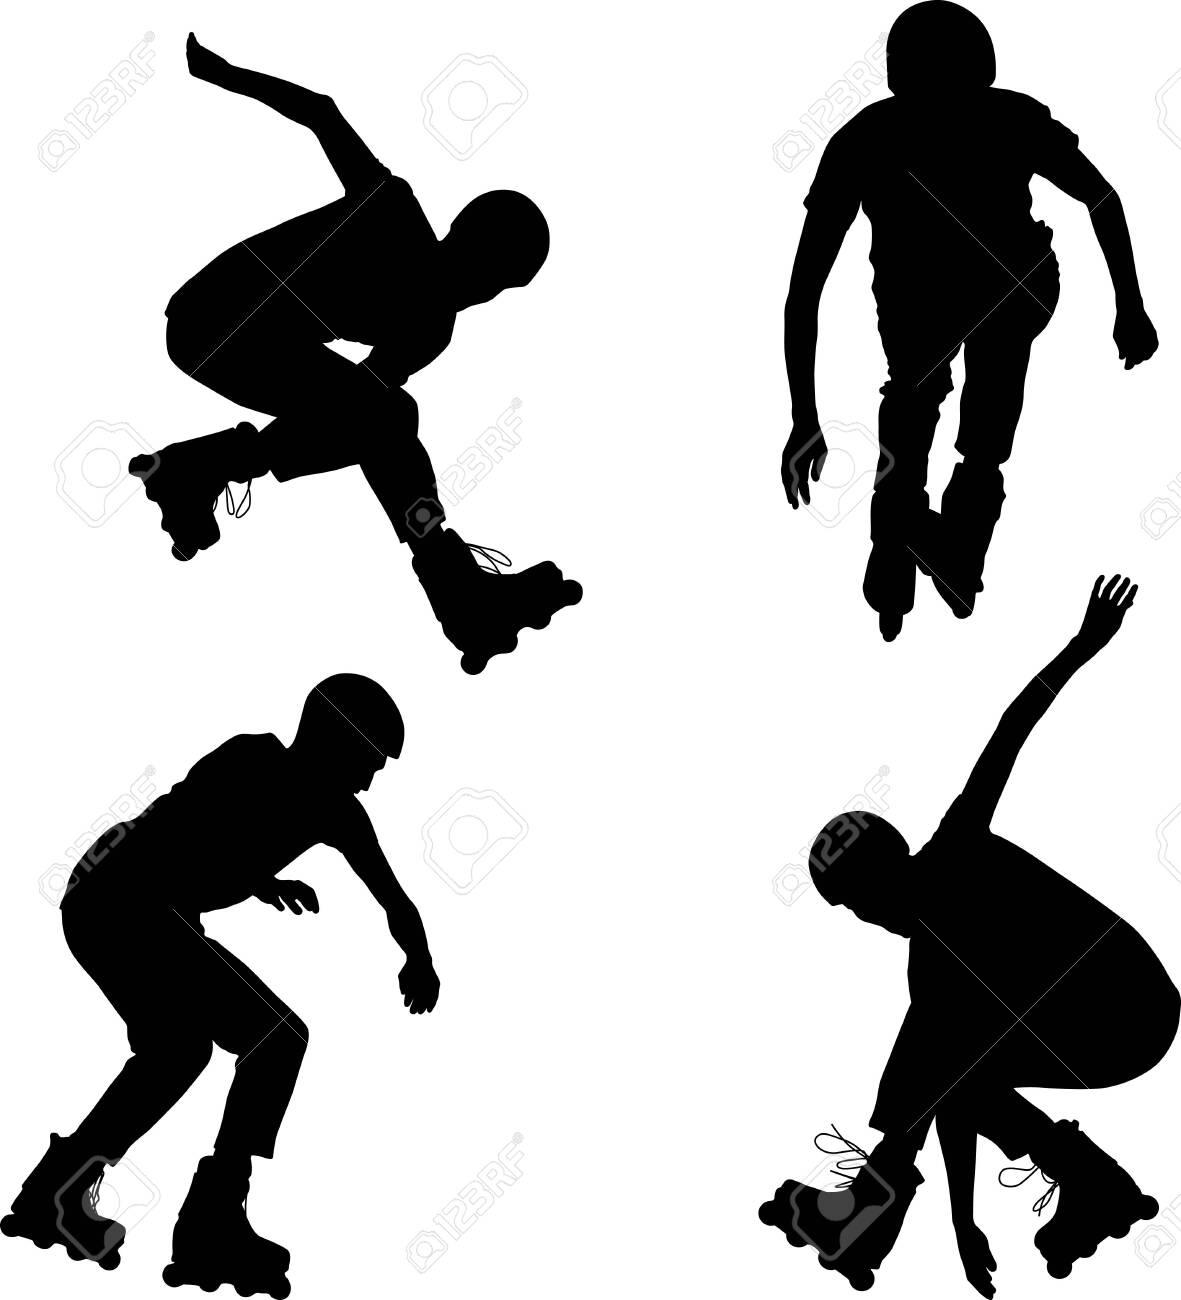 Inline roller skater silhouettes - 129949718